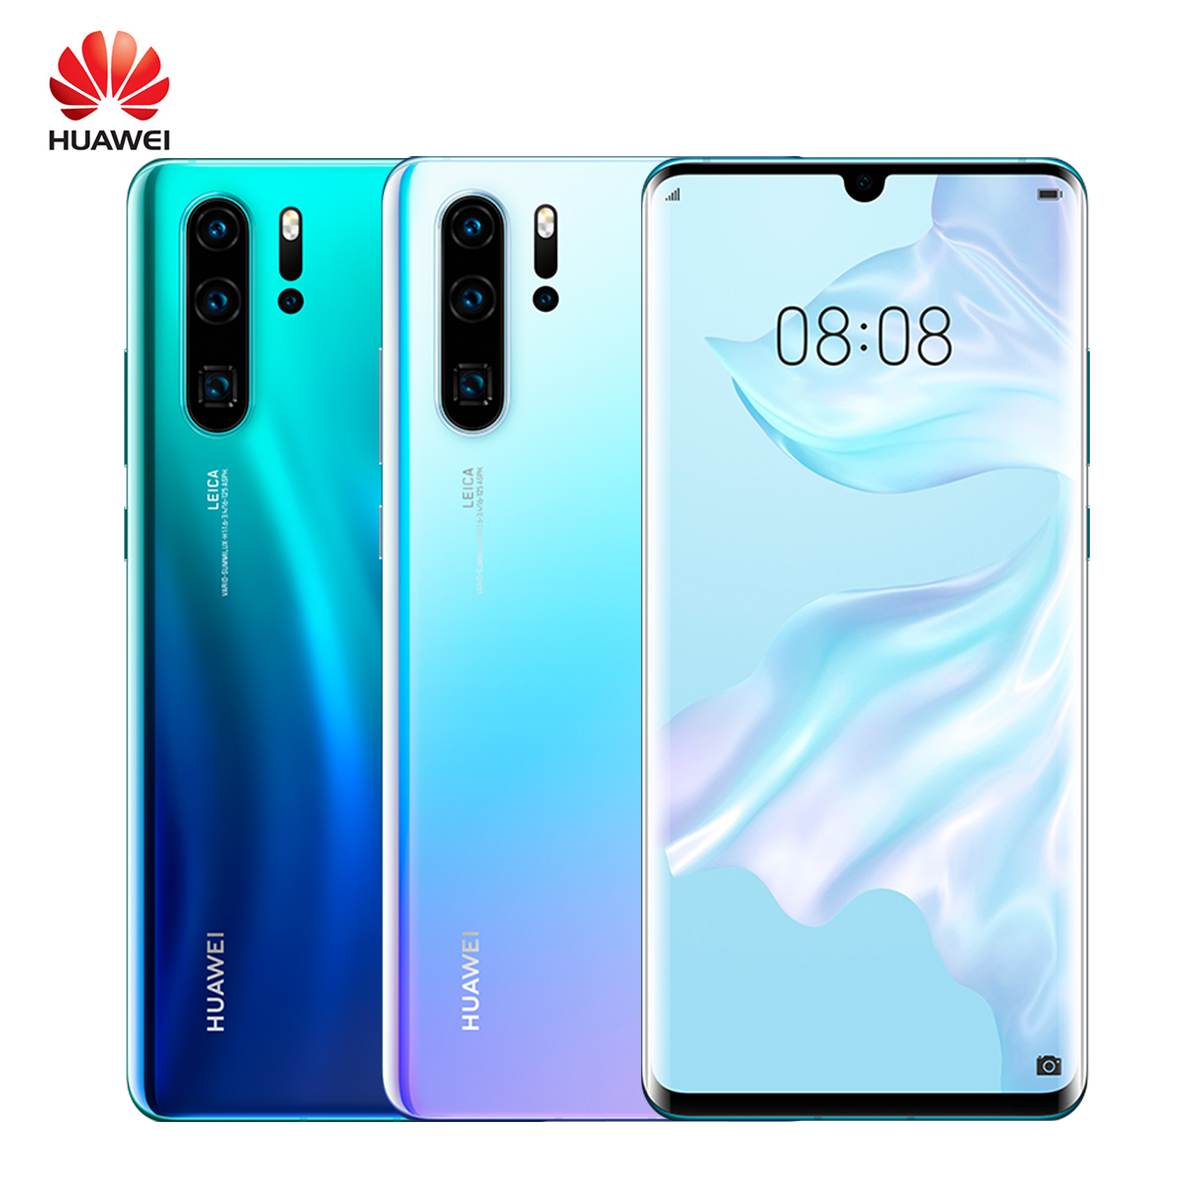 Huawei P30 Pro 8 + 256GB téléphone Mobile 6.47 ''plein écran OLED Kirin 980 Smartphone NFC GPS Android 9.1 5 caméras 40MP + 32MP